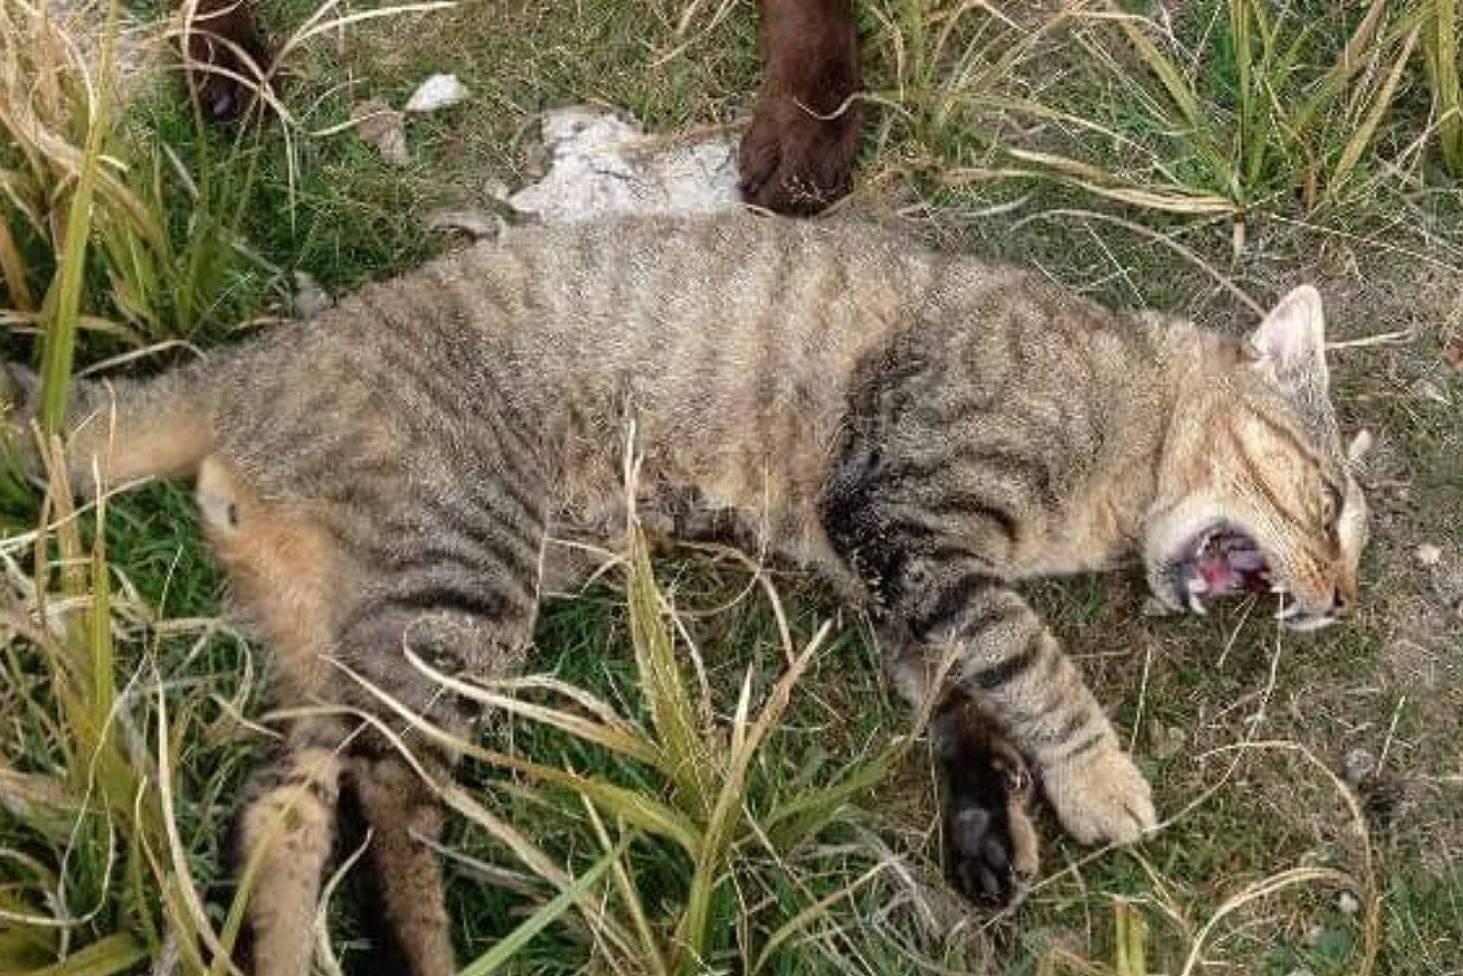 Big cat sighting at Burkes Pass revives mystery | Stuff co nz